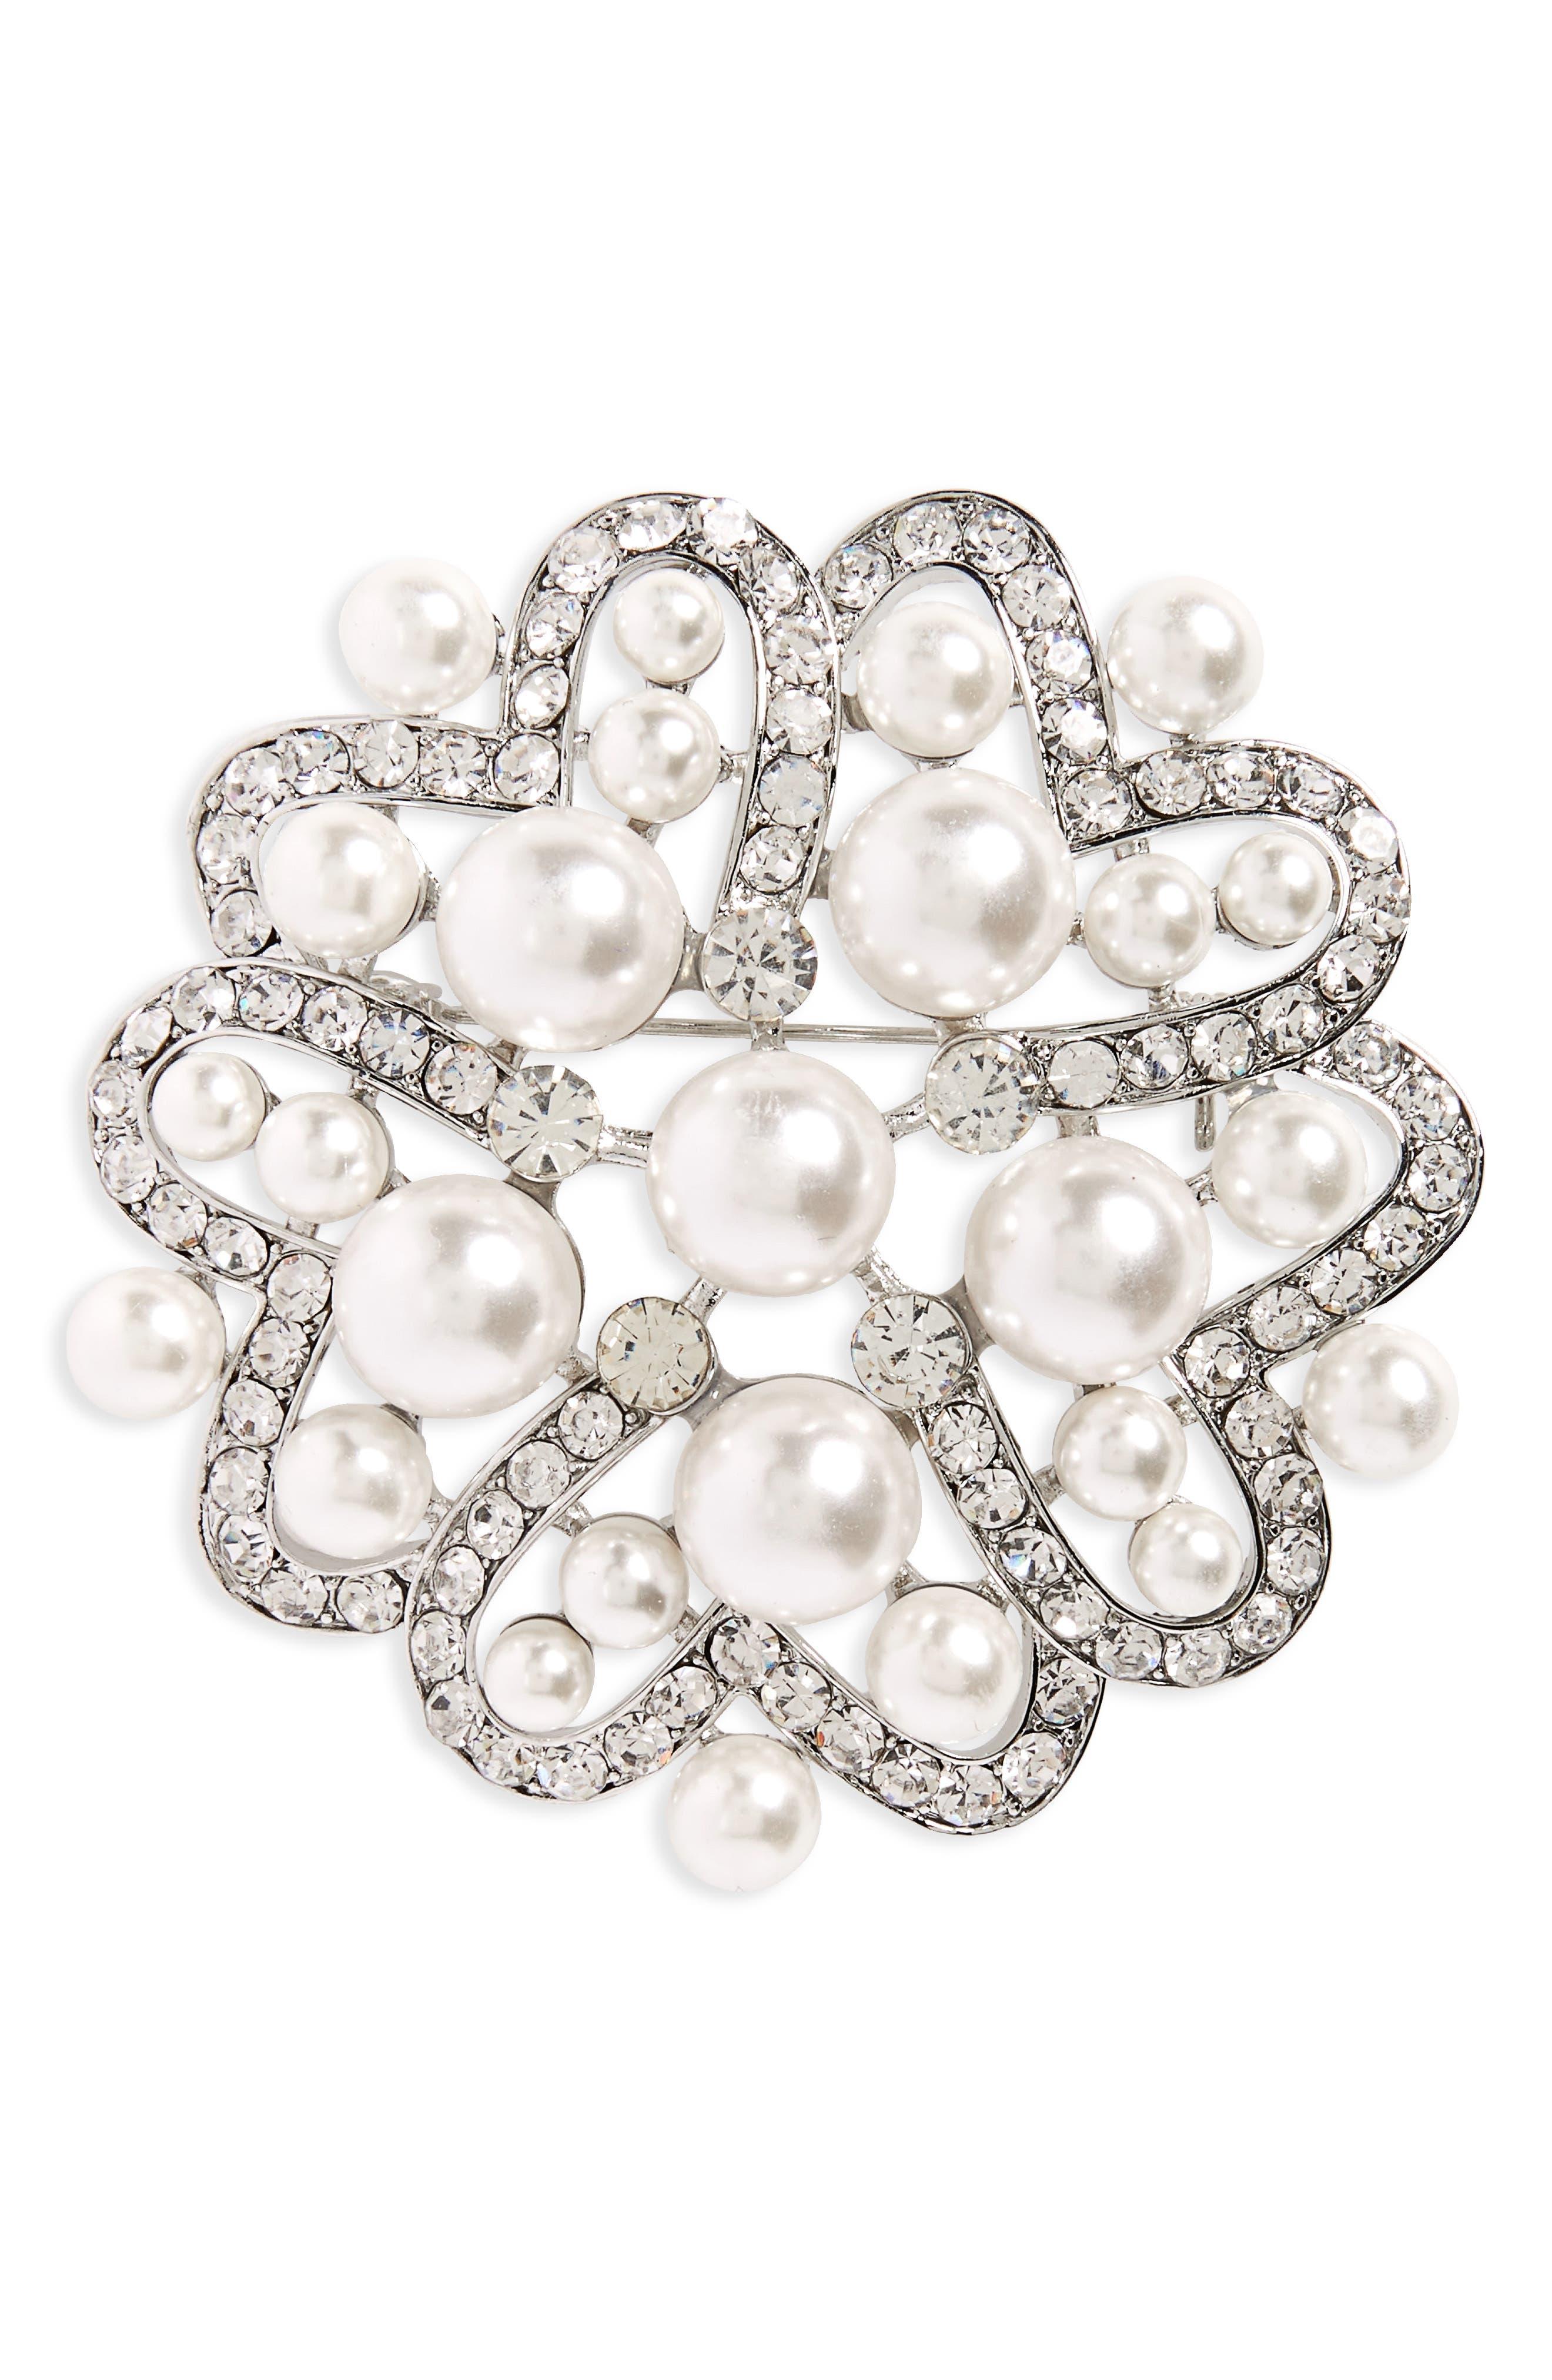 Alternate Image 1 Selected - Nina Imitation Pearl & Crystal Brooch